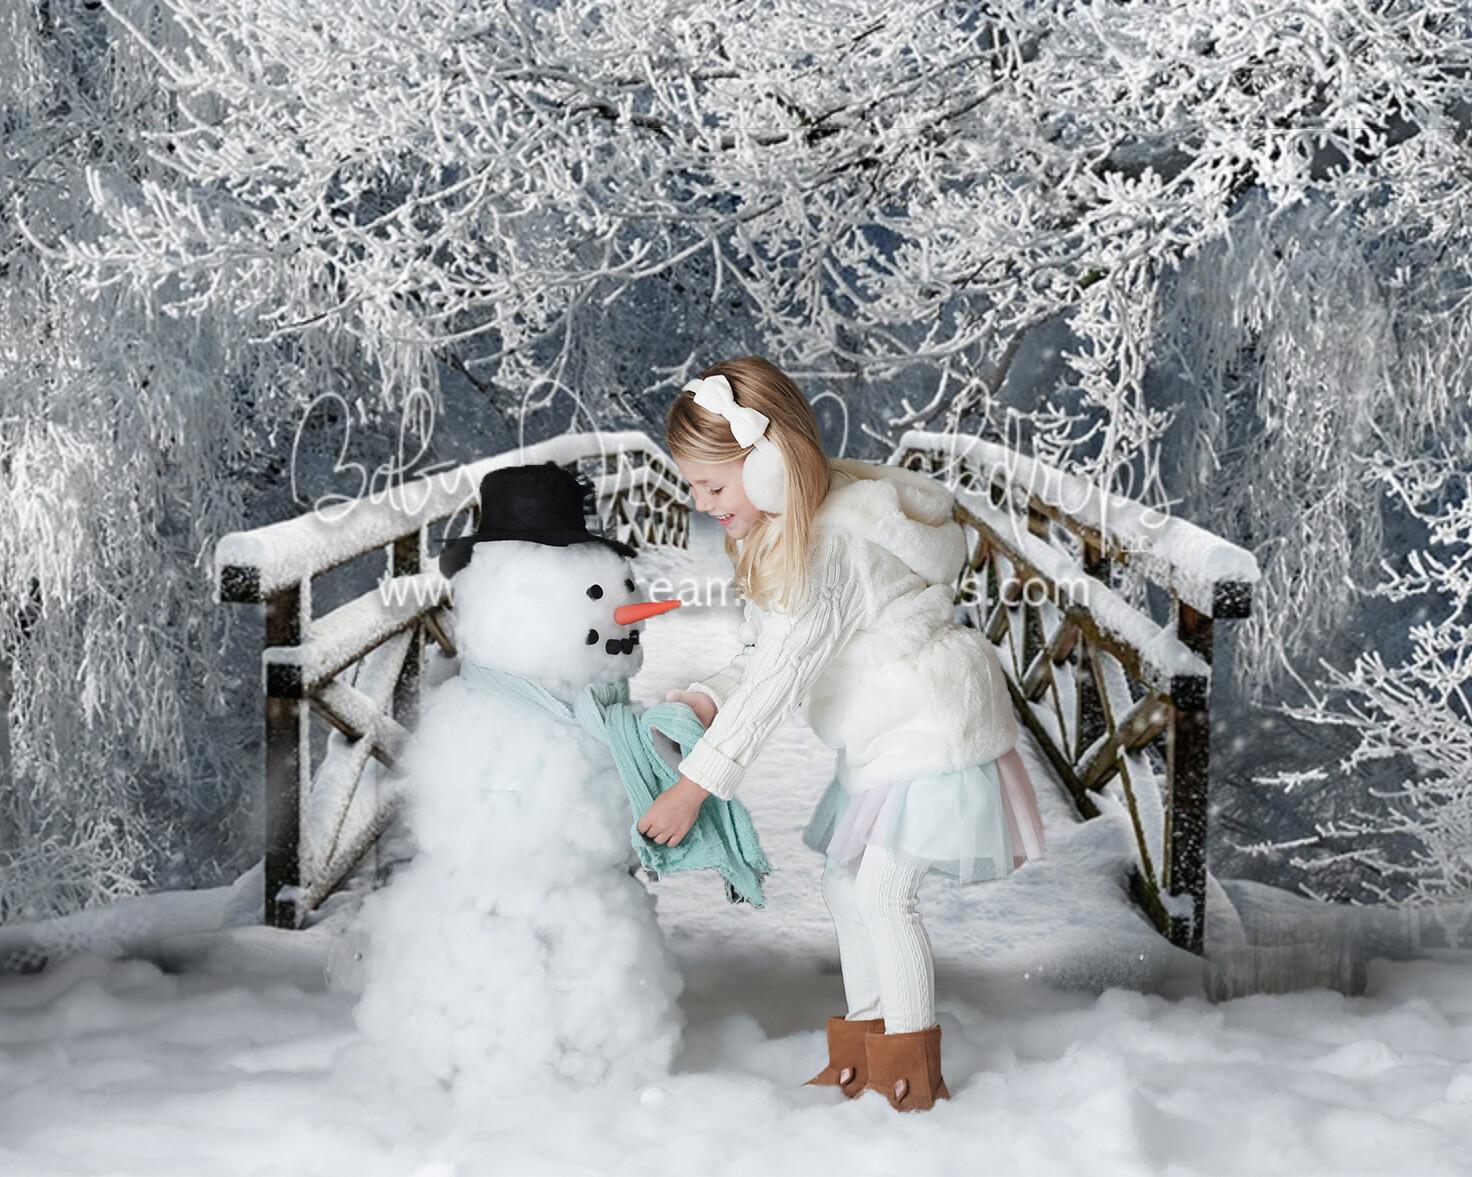 Walk through Winter November 1-8